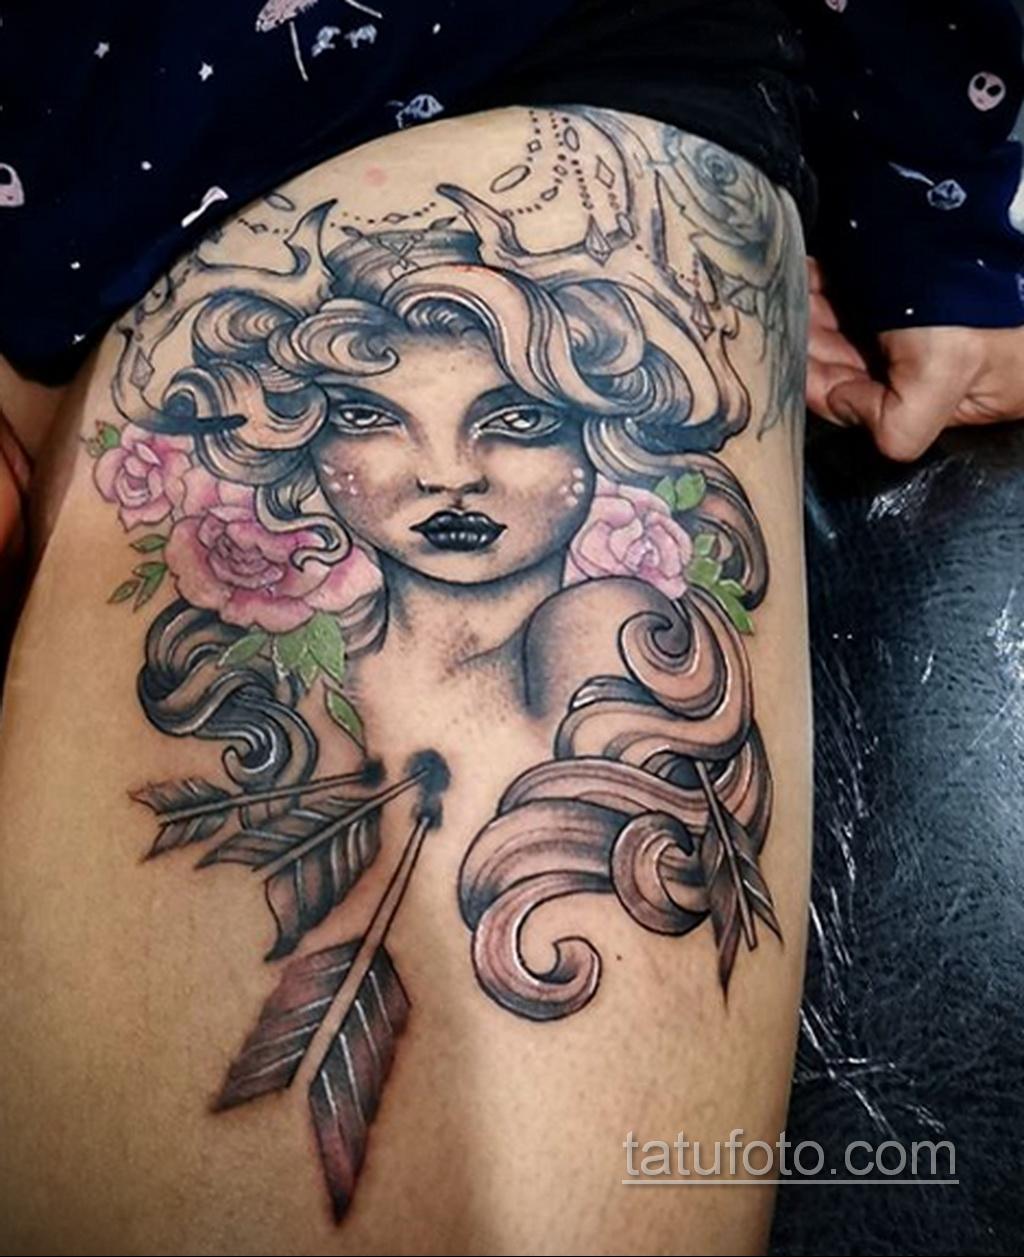 Фото классного рисунка татуировки 18.05.2020 №052 -cool tattoo- tatufoto.com